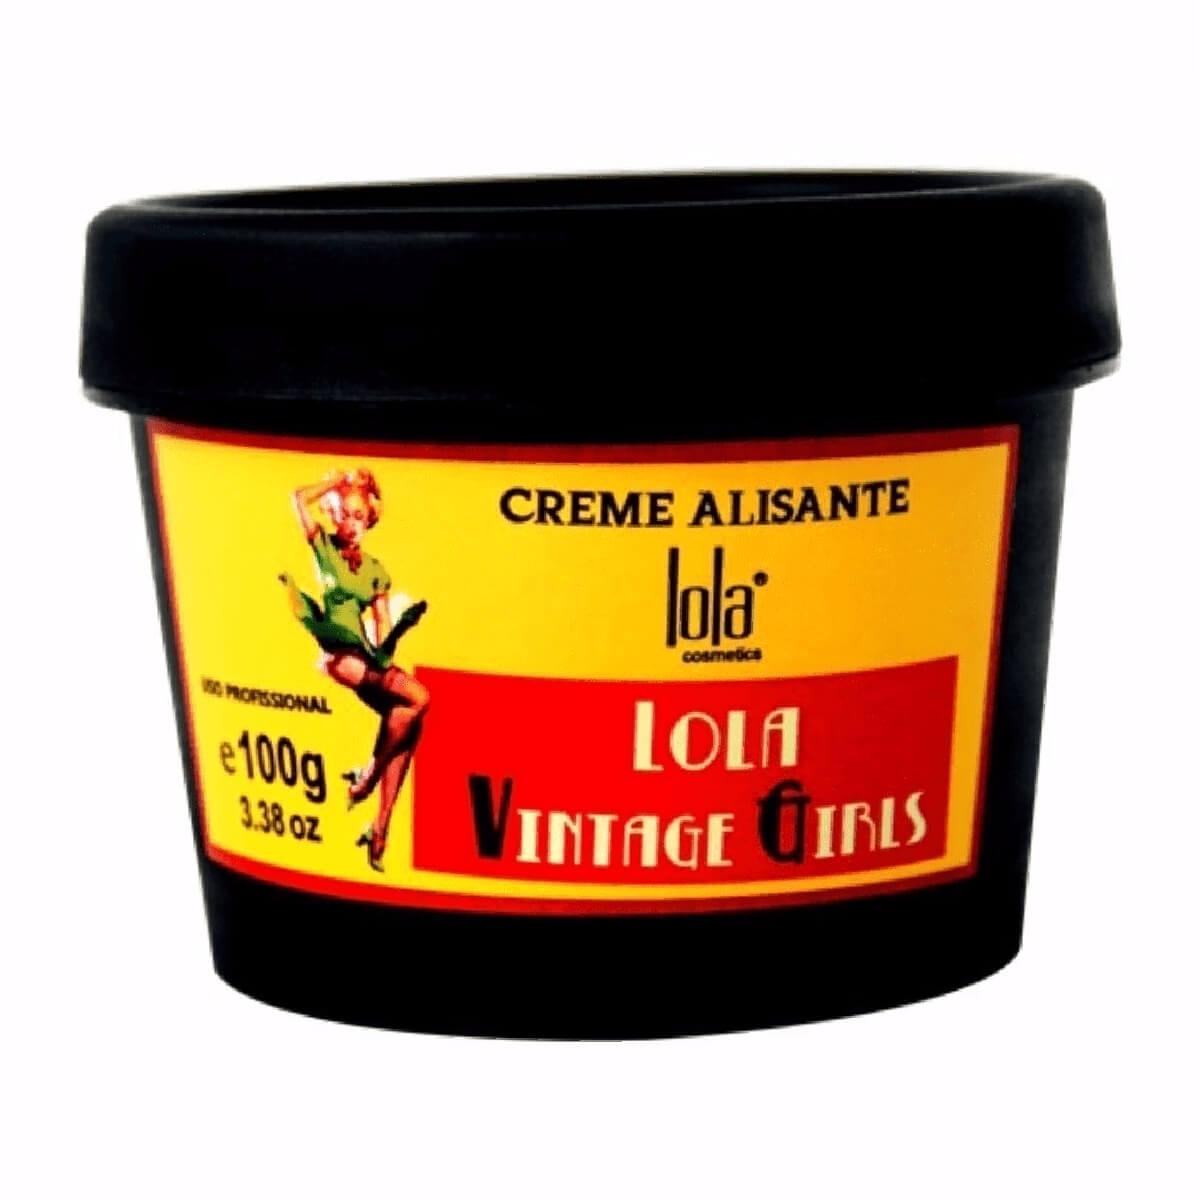 Creme Capilar Alisante Lola Hair Vintage Girls com 100g 100g